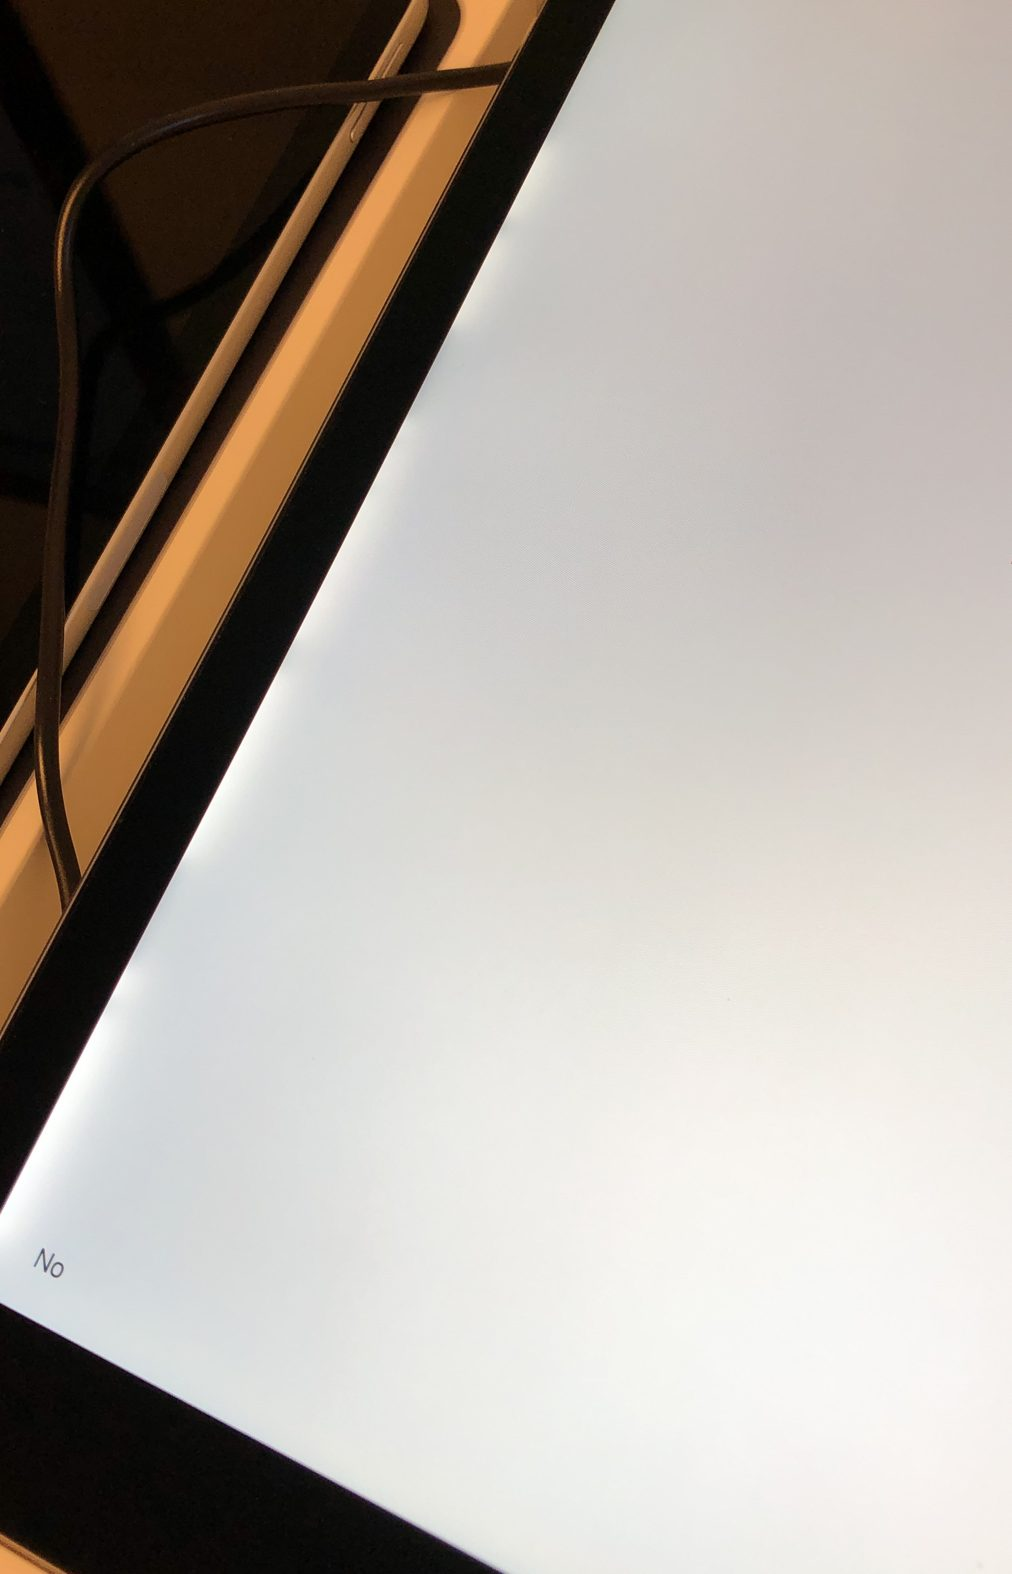 "iPad Pro 12.9"" Wi-Fi + Cellular (2nd Gen) 512GB, 512GB, Space Gray, image 3"